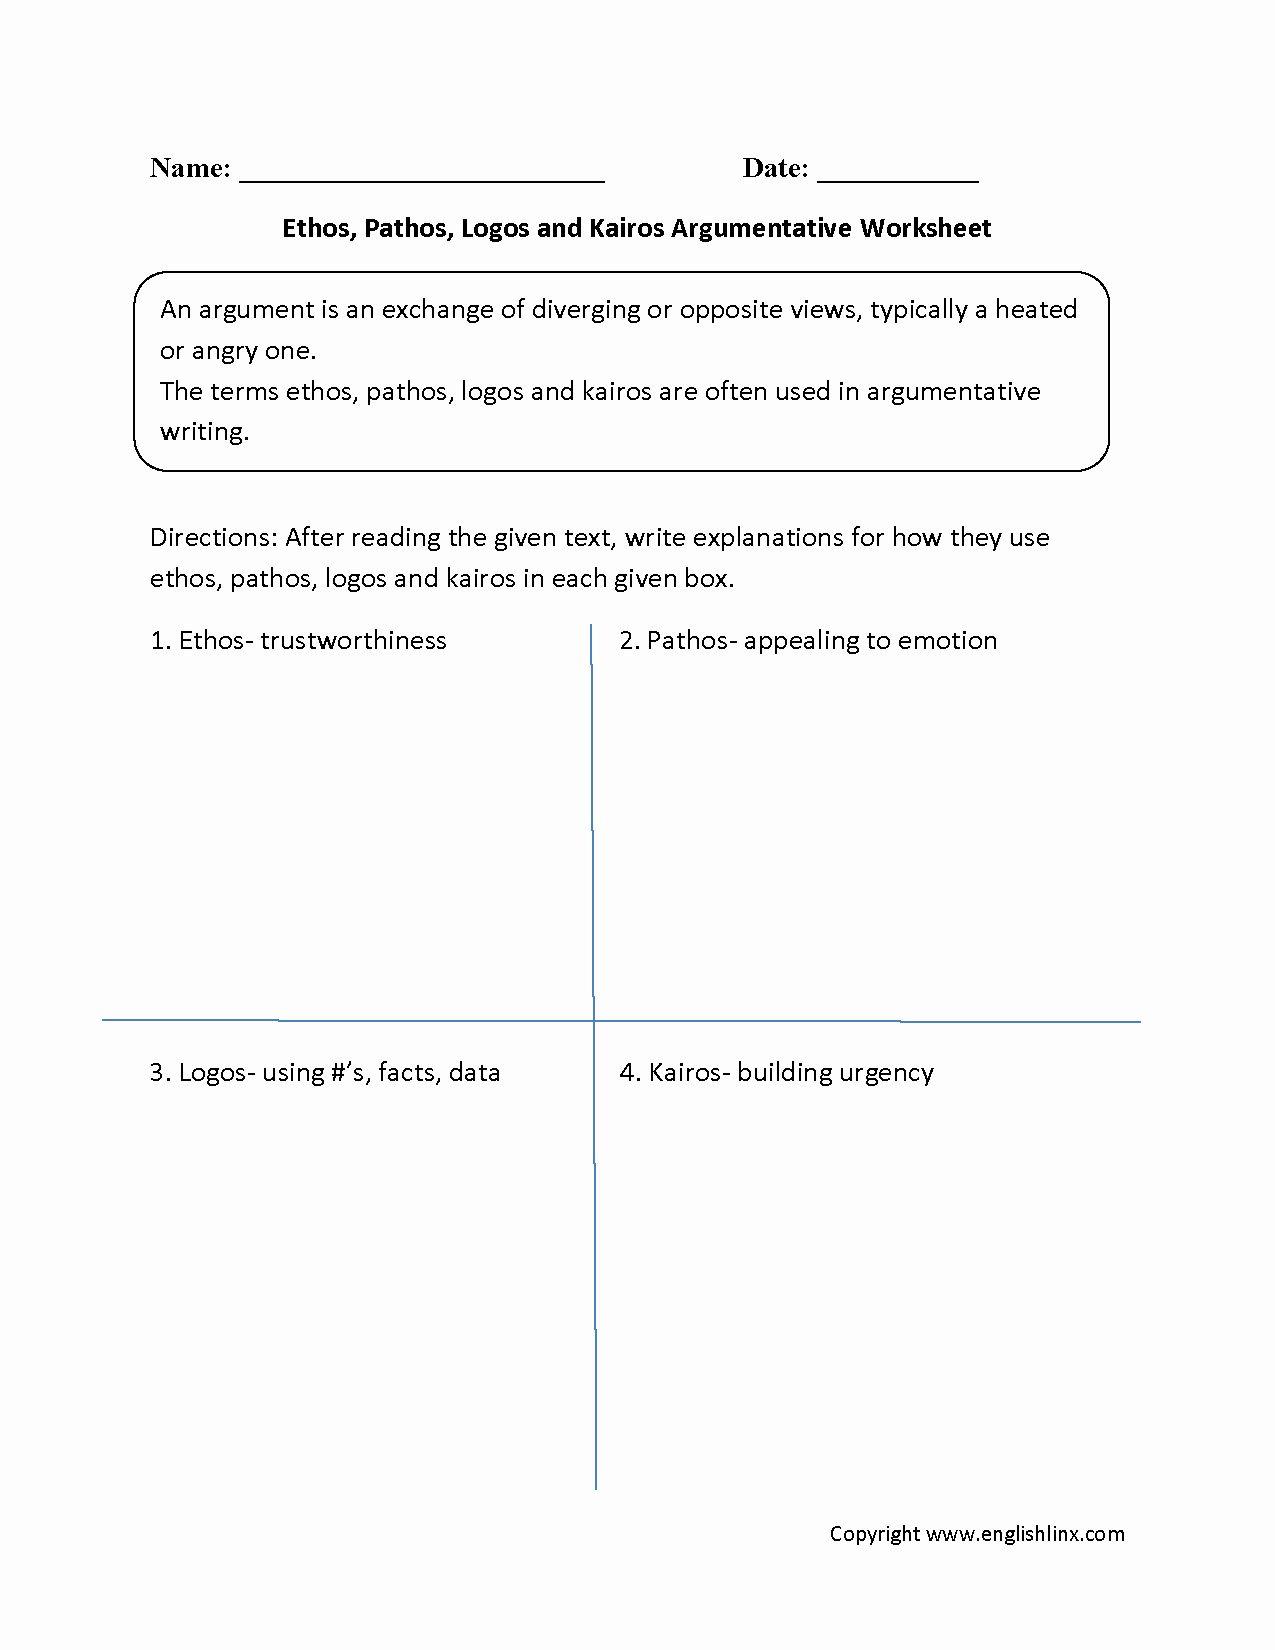 Ethos Pathos Logos Worksheet Answers